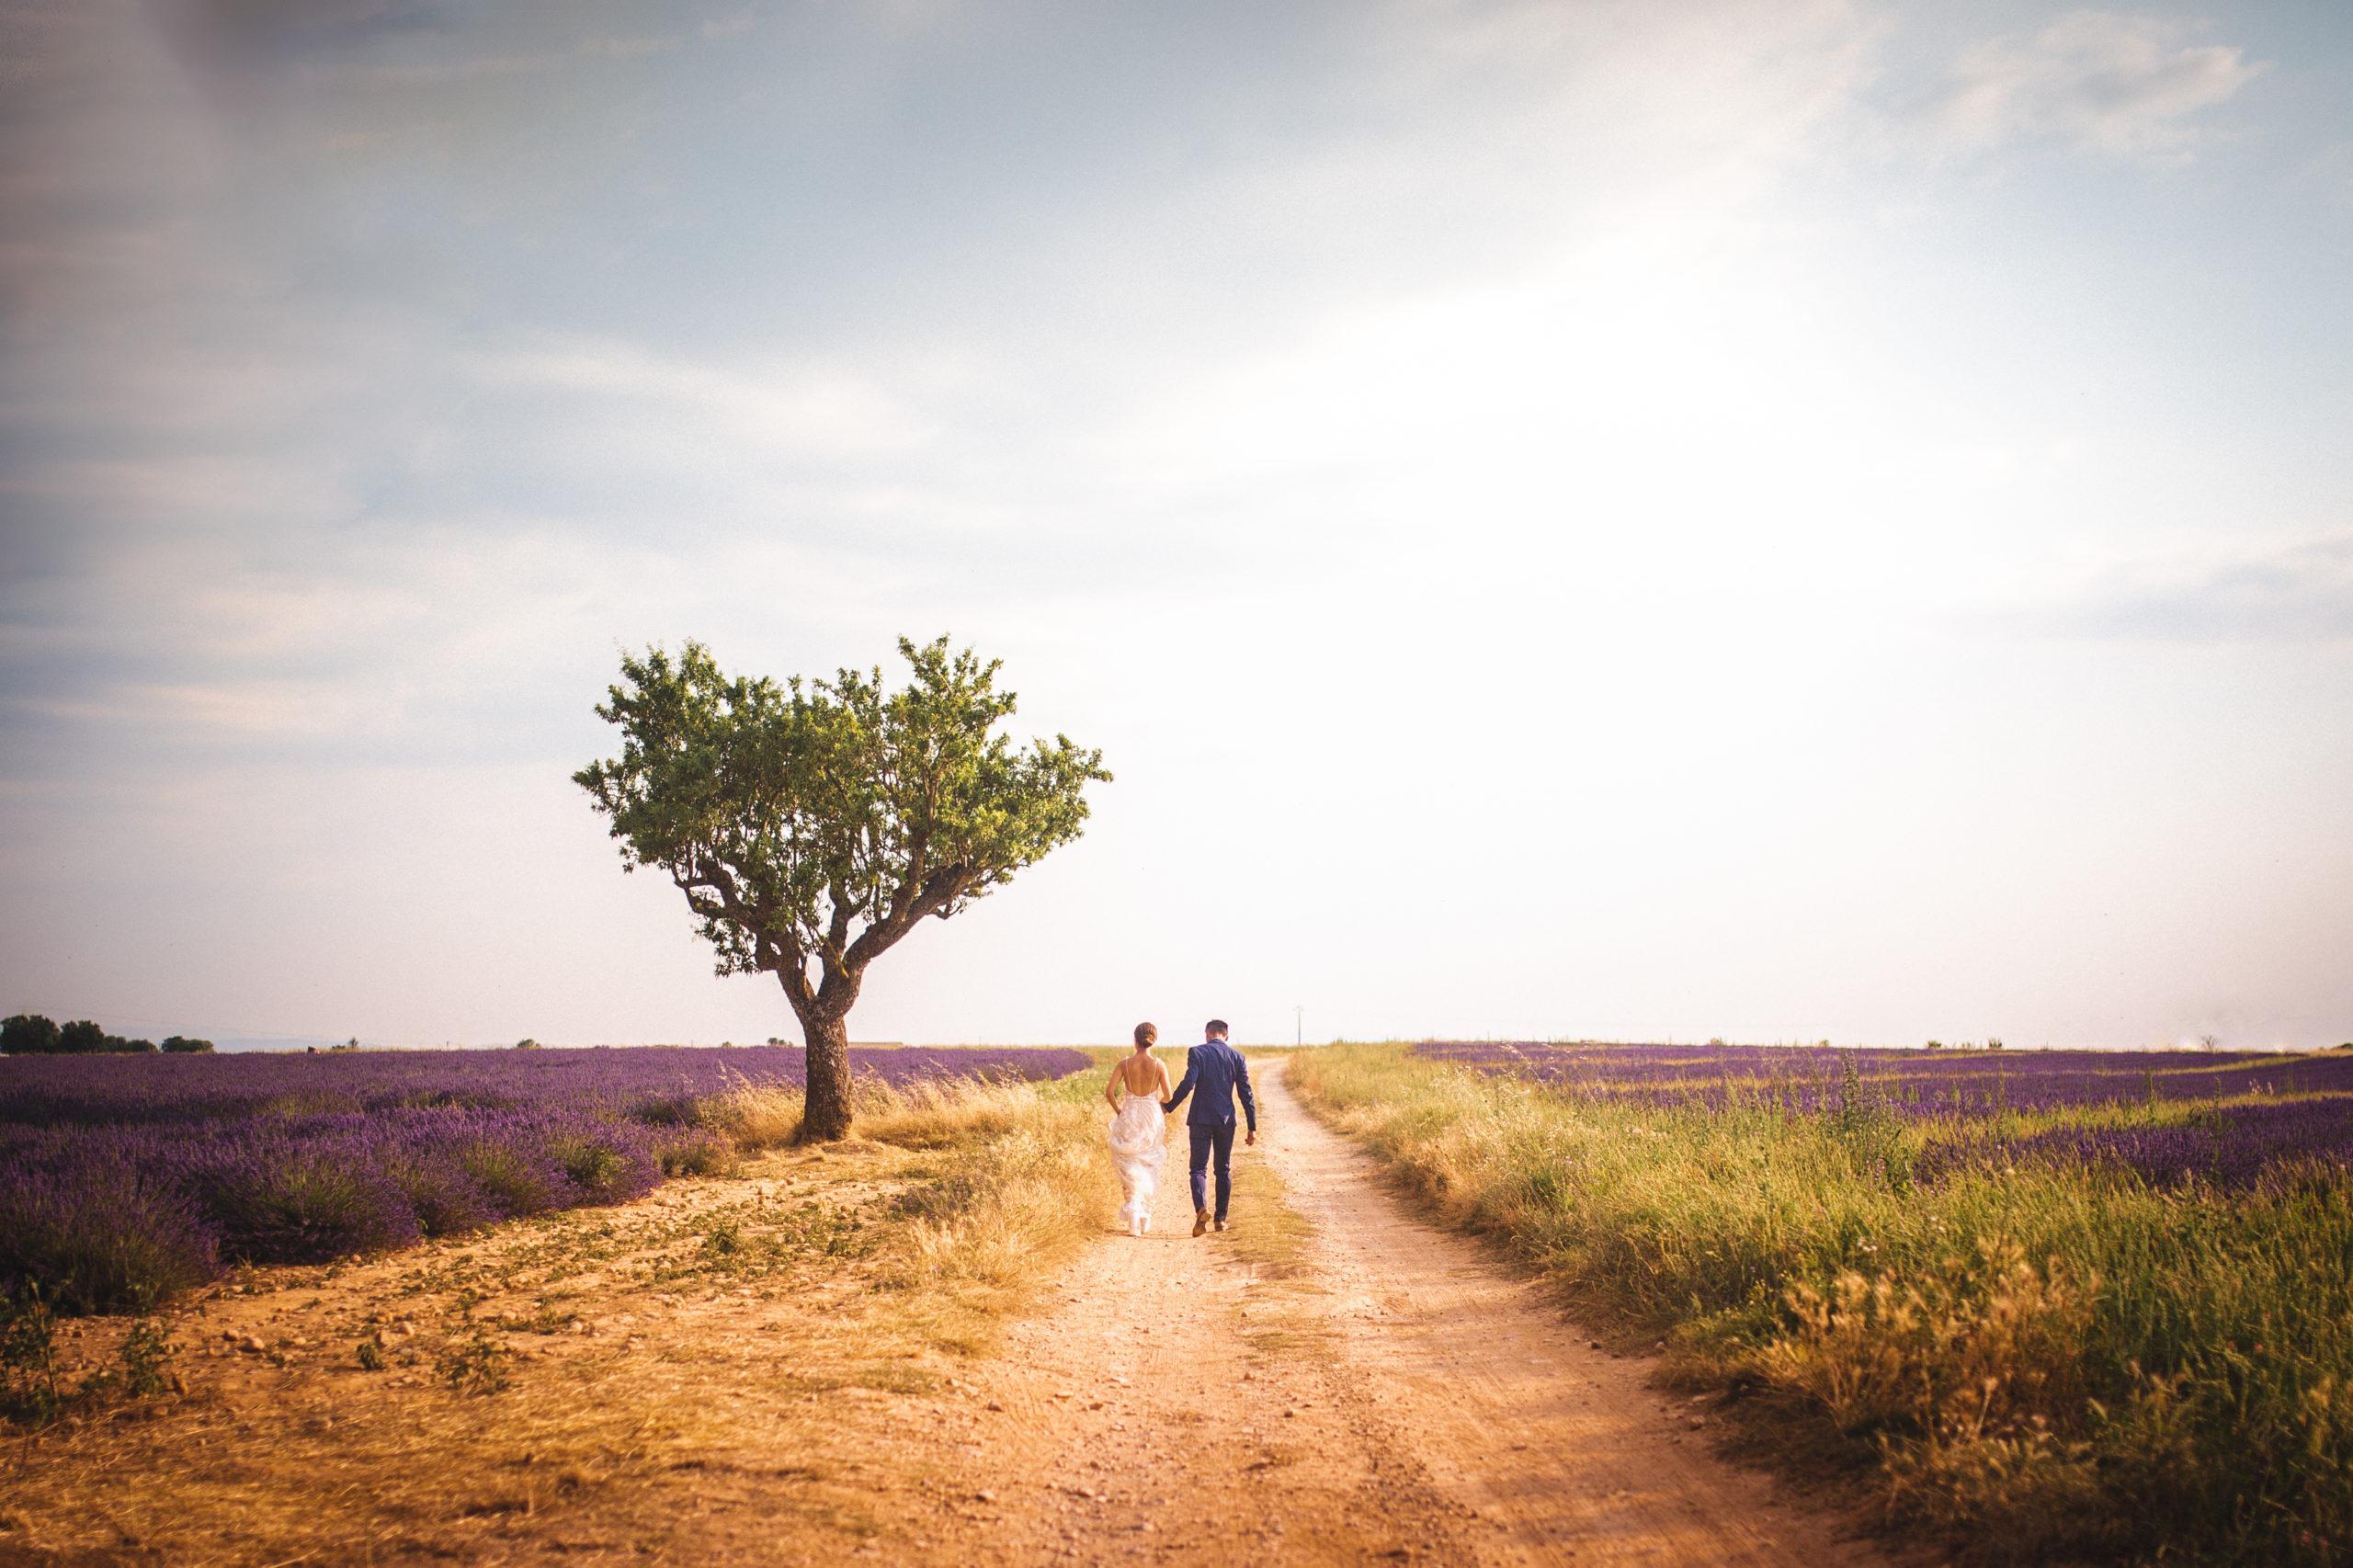 photographe, lyon, lilium, eleven, liliumeleven, mariage, wedding, pierre, vermare, mariage, mariages, Lyon, Photo, Lilium eleven